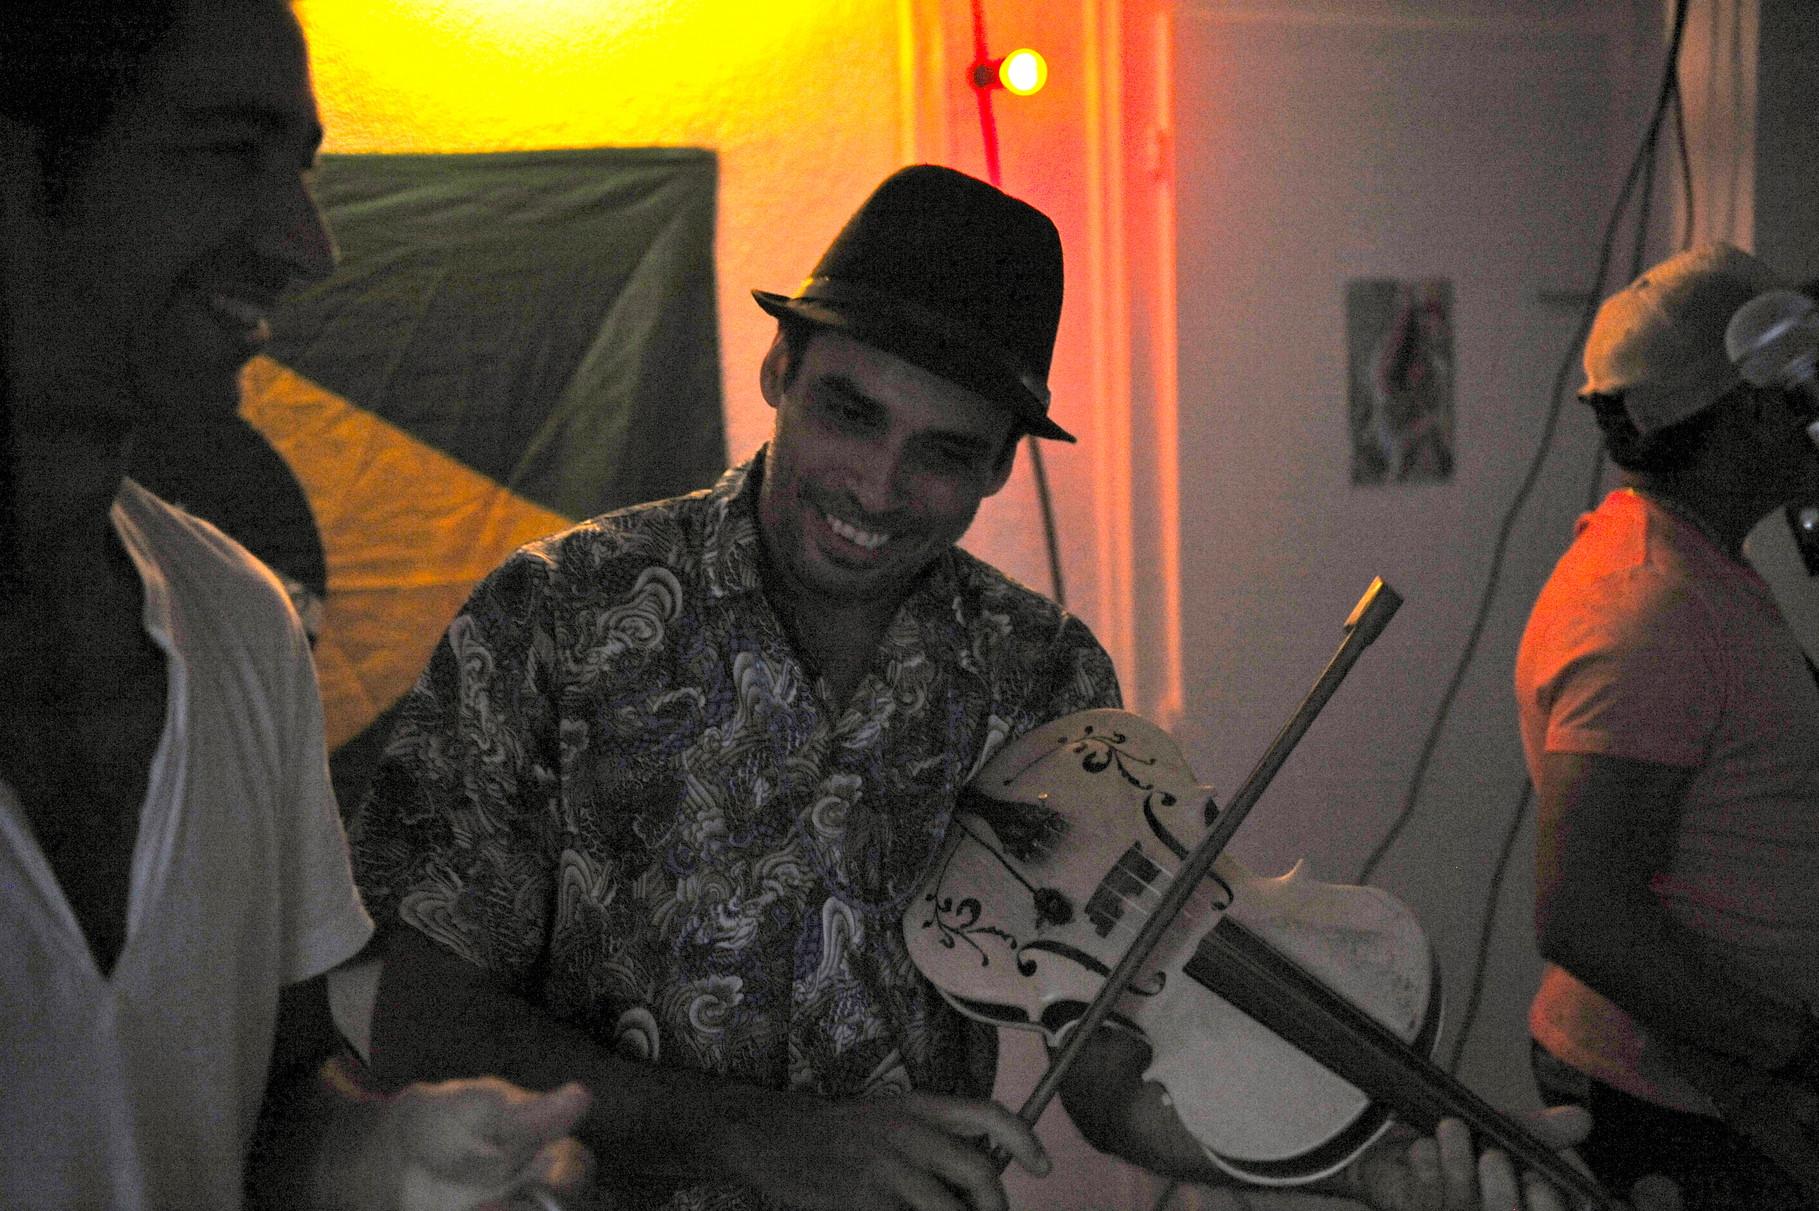 Carlinhos Ferraz aus Curitiba. Forró Musiker. Spielte im Kolpinghaus in Bern!